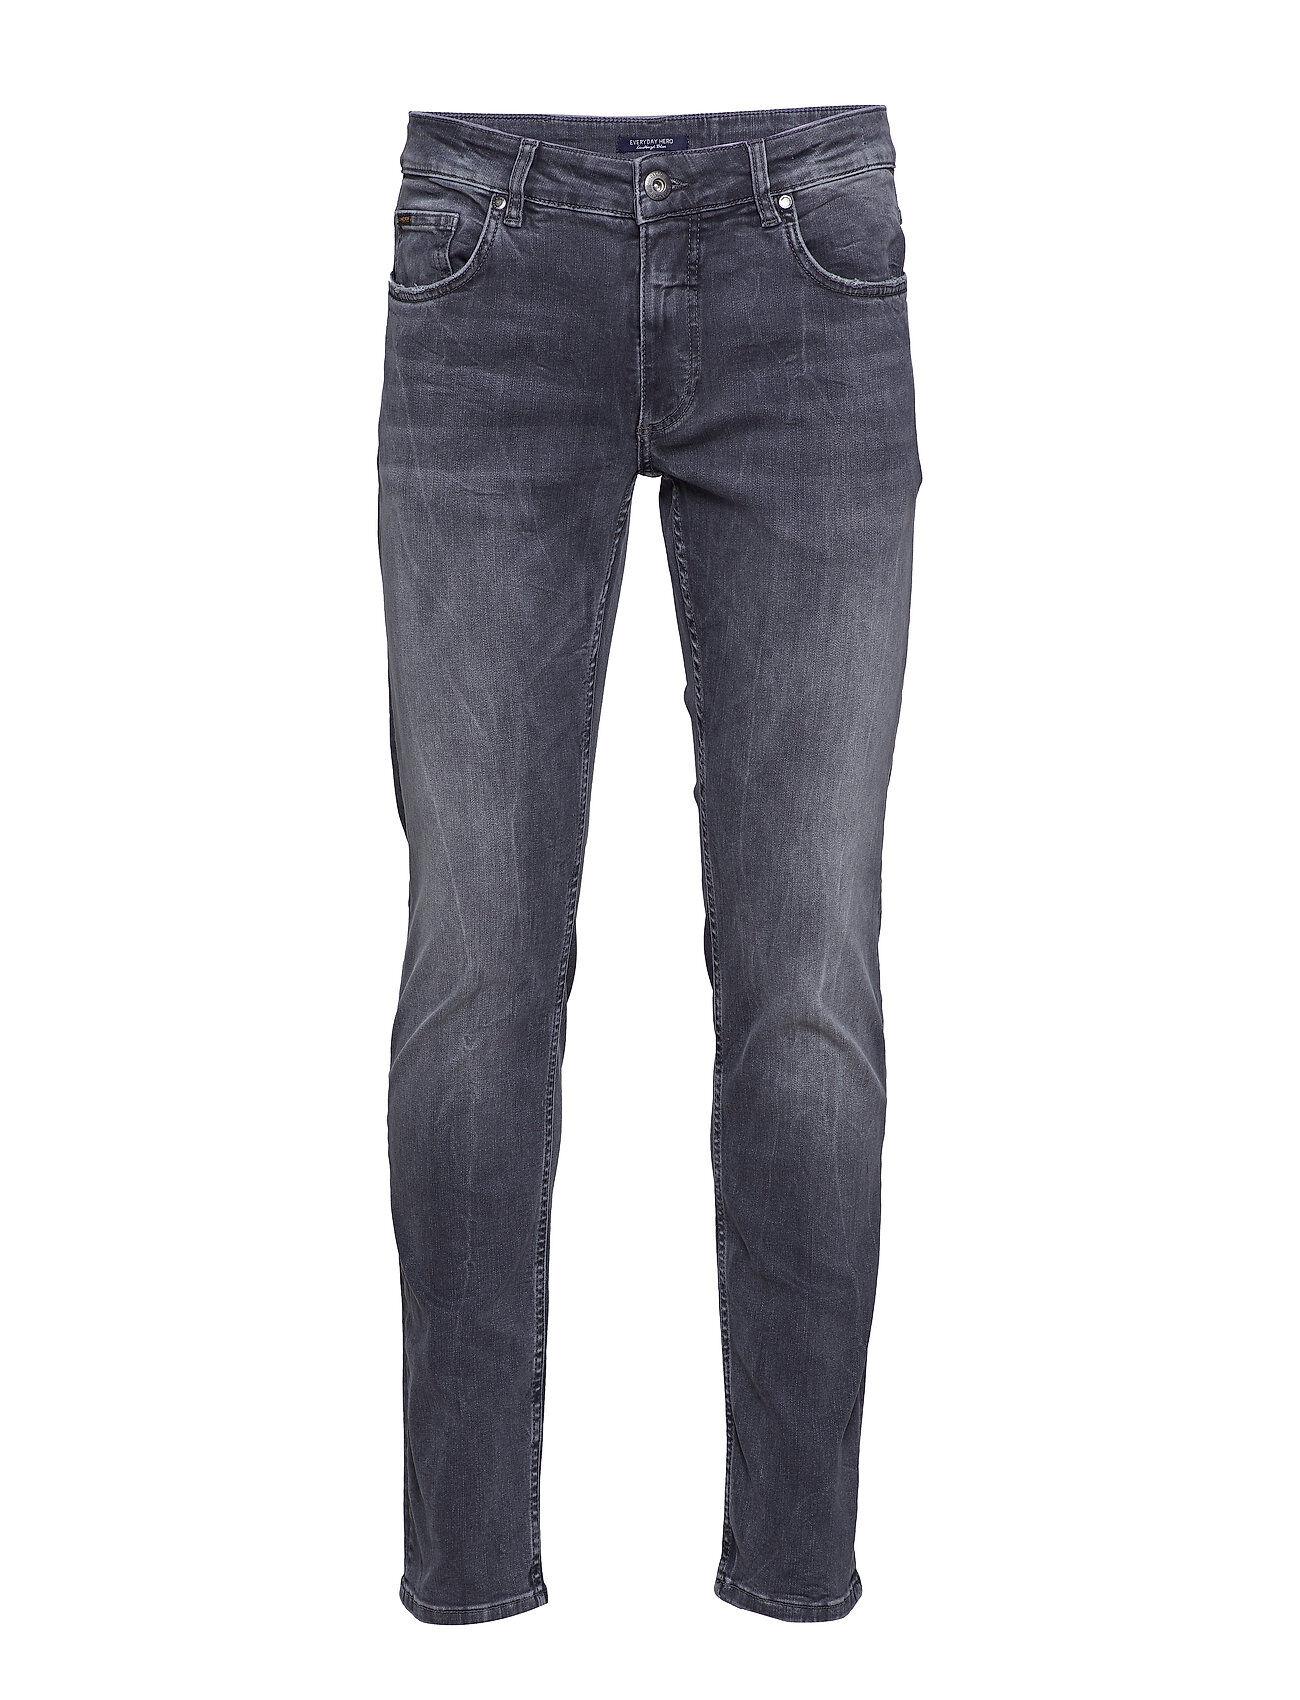 Lindbergh Superflex Jeans